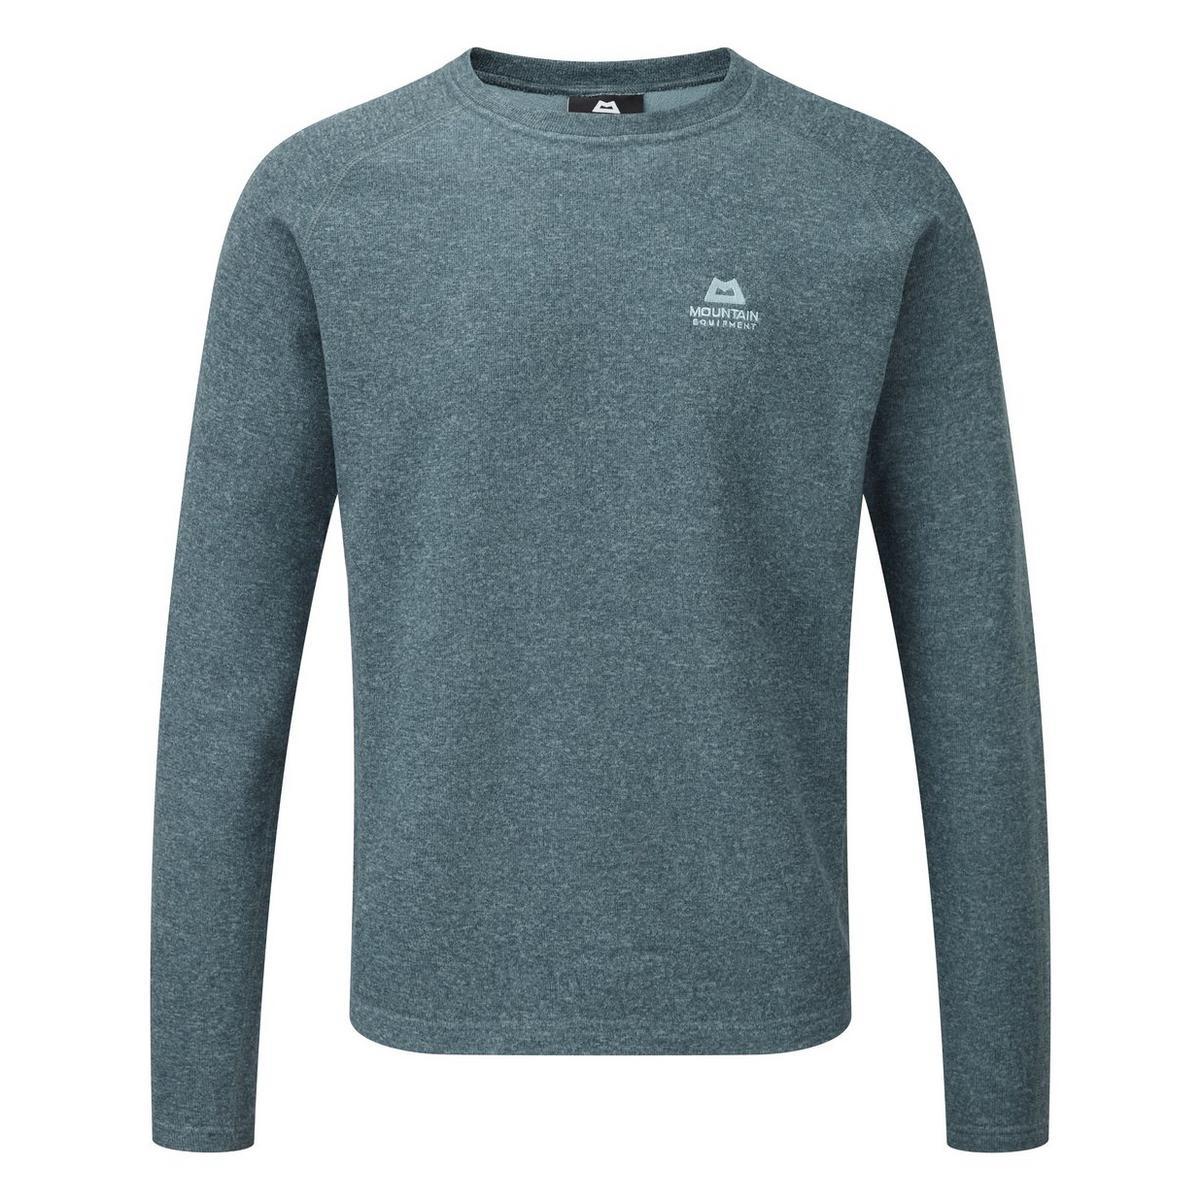 Mountain Equipment Men's Kore Sweater - Blue